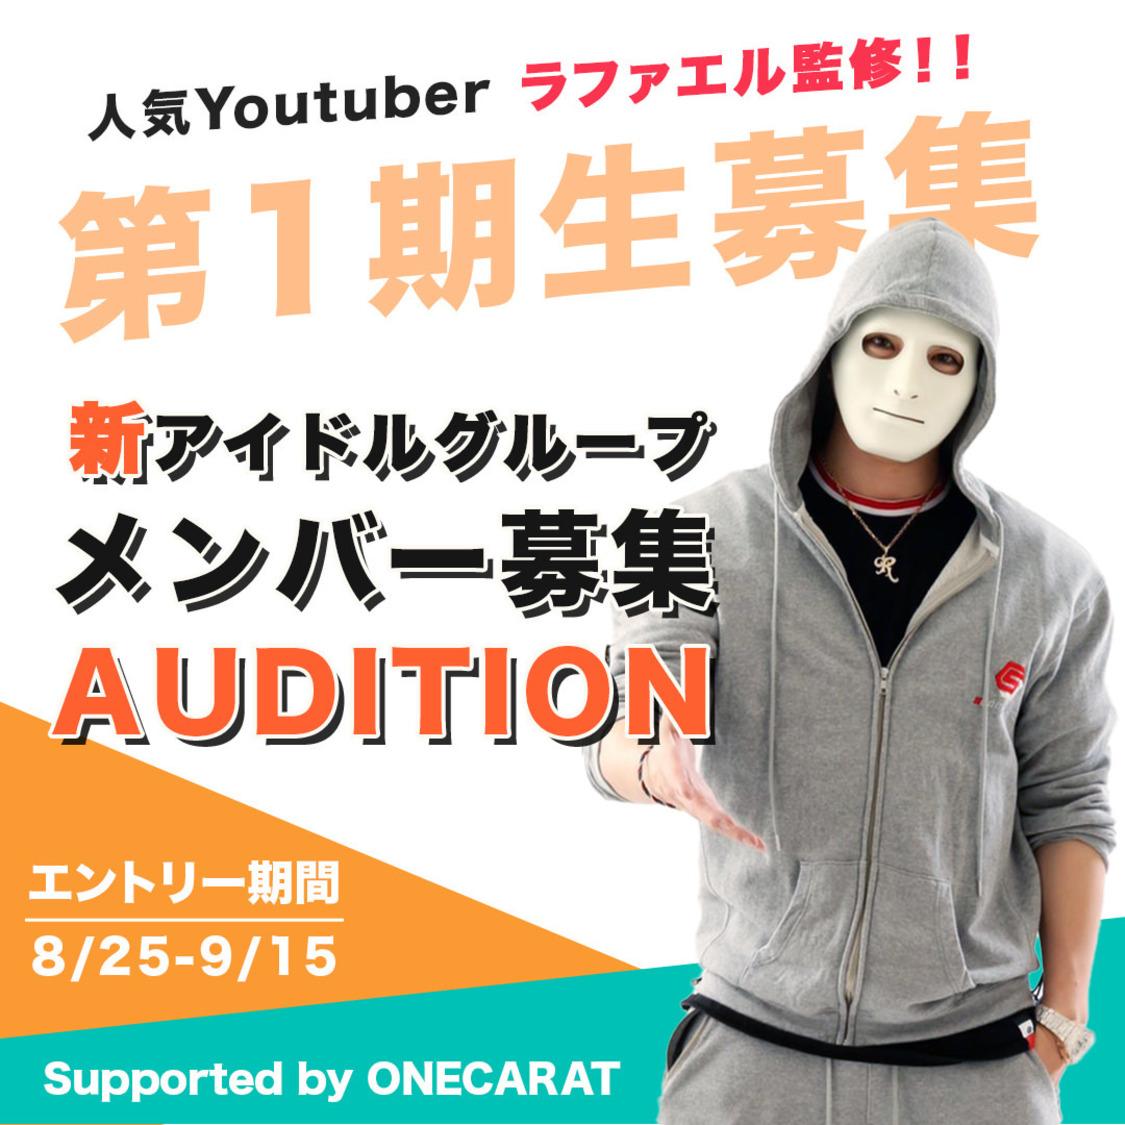 YouTuberラファエル、プロデュースの新アイドルグループオーディション開催「僕と一緒にアイドル業界の頂点を目指しましょう!」